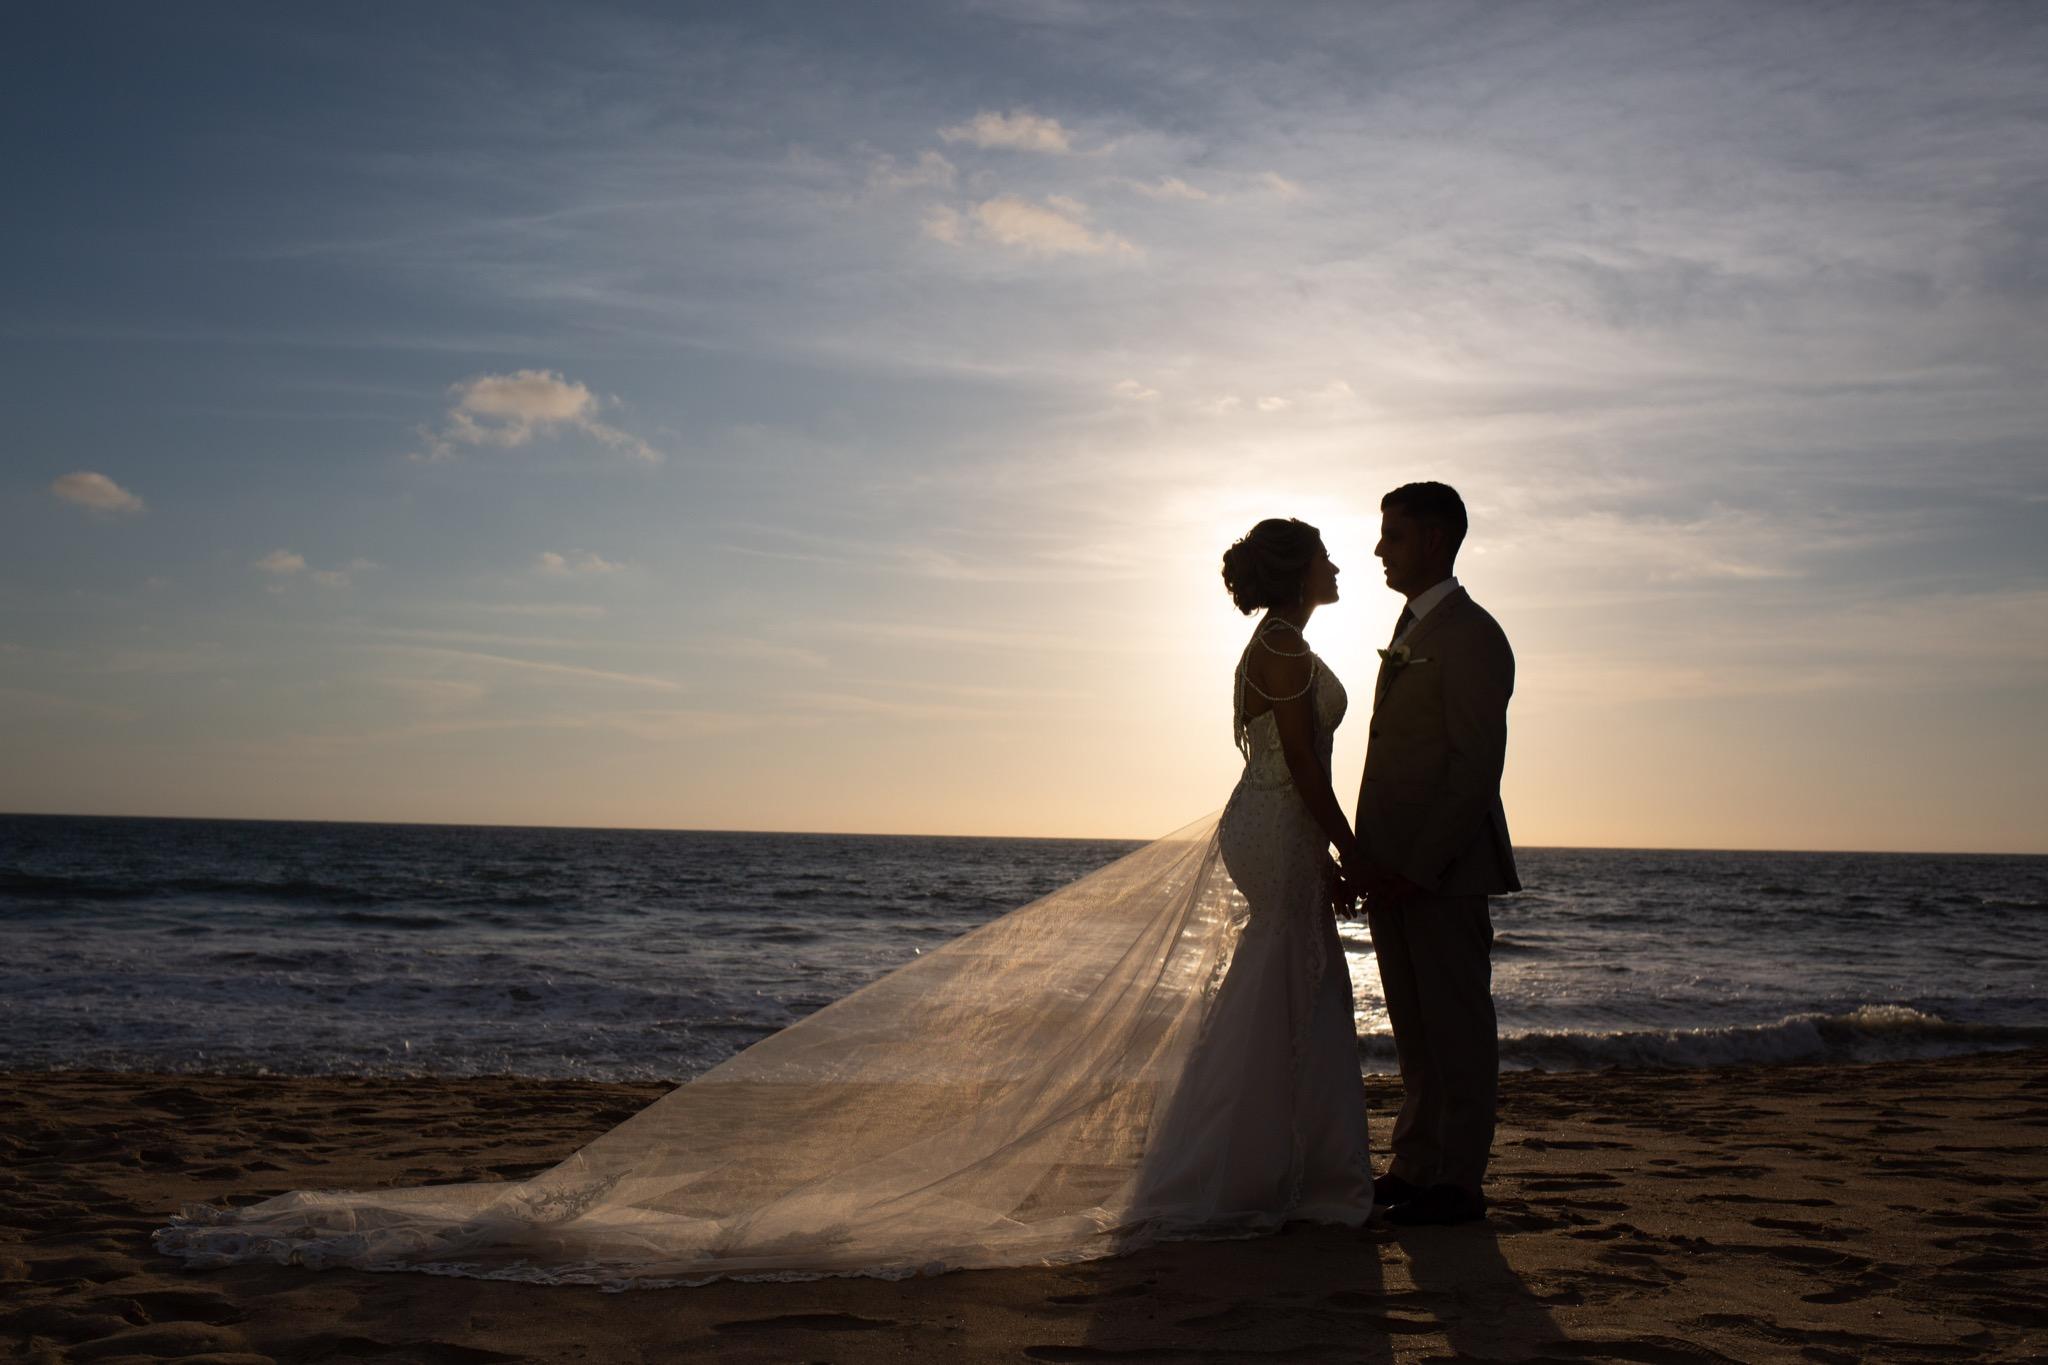 Javier_noriega_fotografo_bodas_profesional_zacatecas_mexico_mazatlan_sinaloa_photographer_weddings44